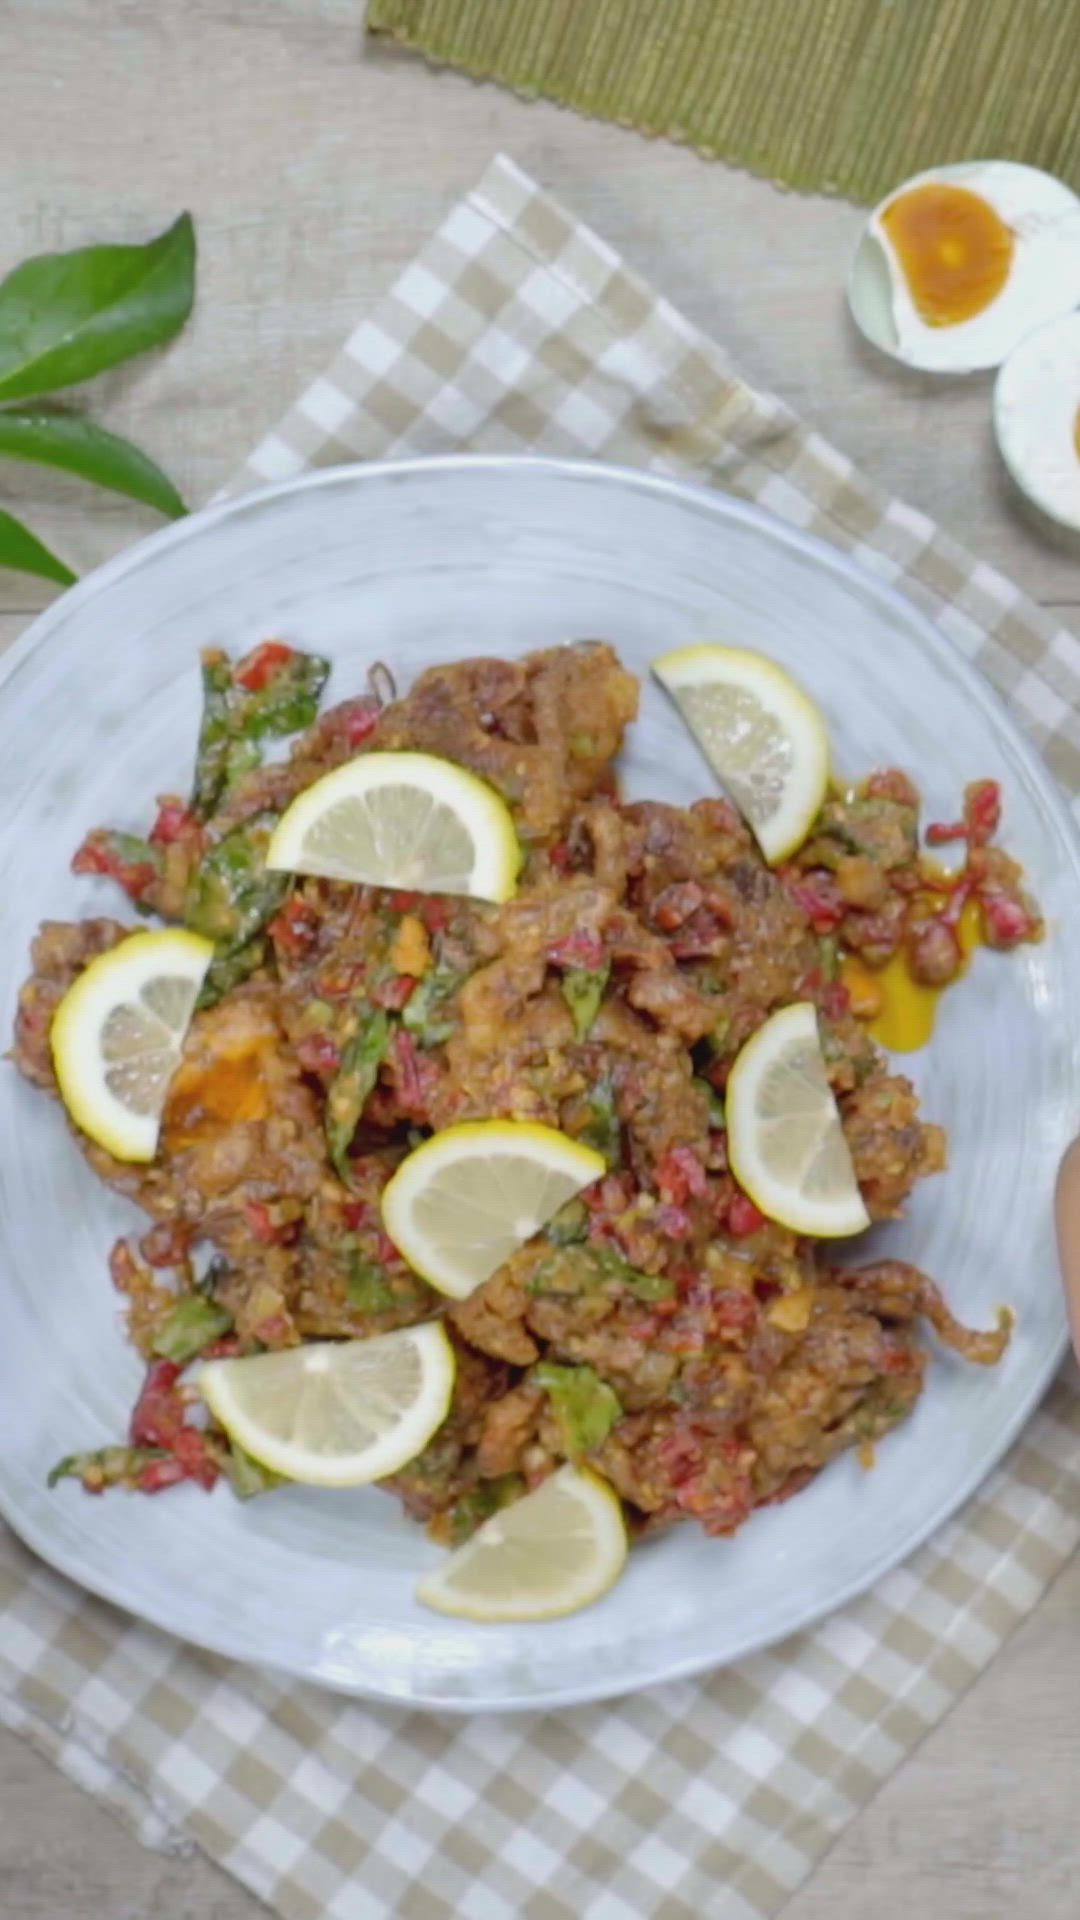 Video Kepiting Soka Telur Asin Cabai Garam Resep Masakan Indonesia Resep Makanan Masakan